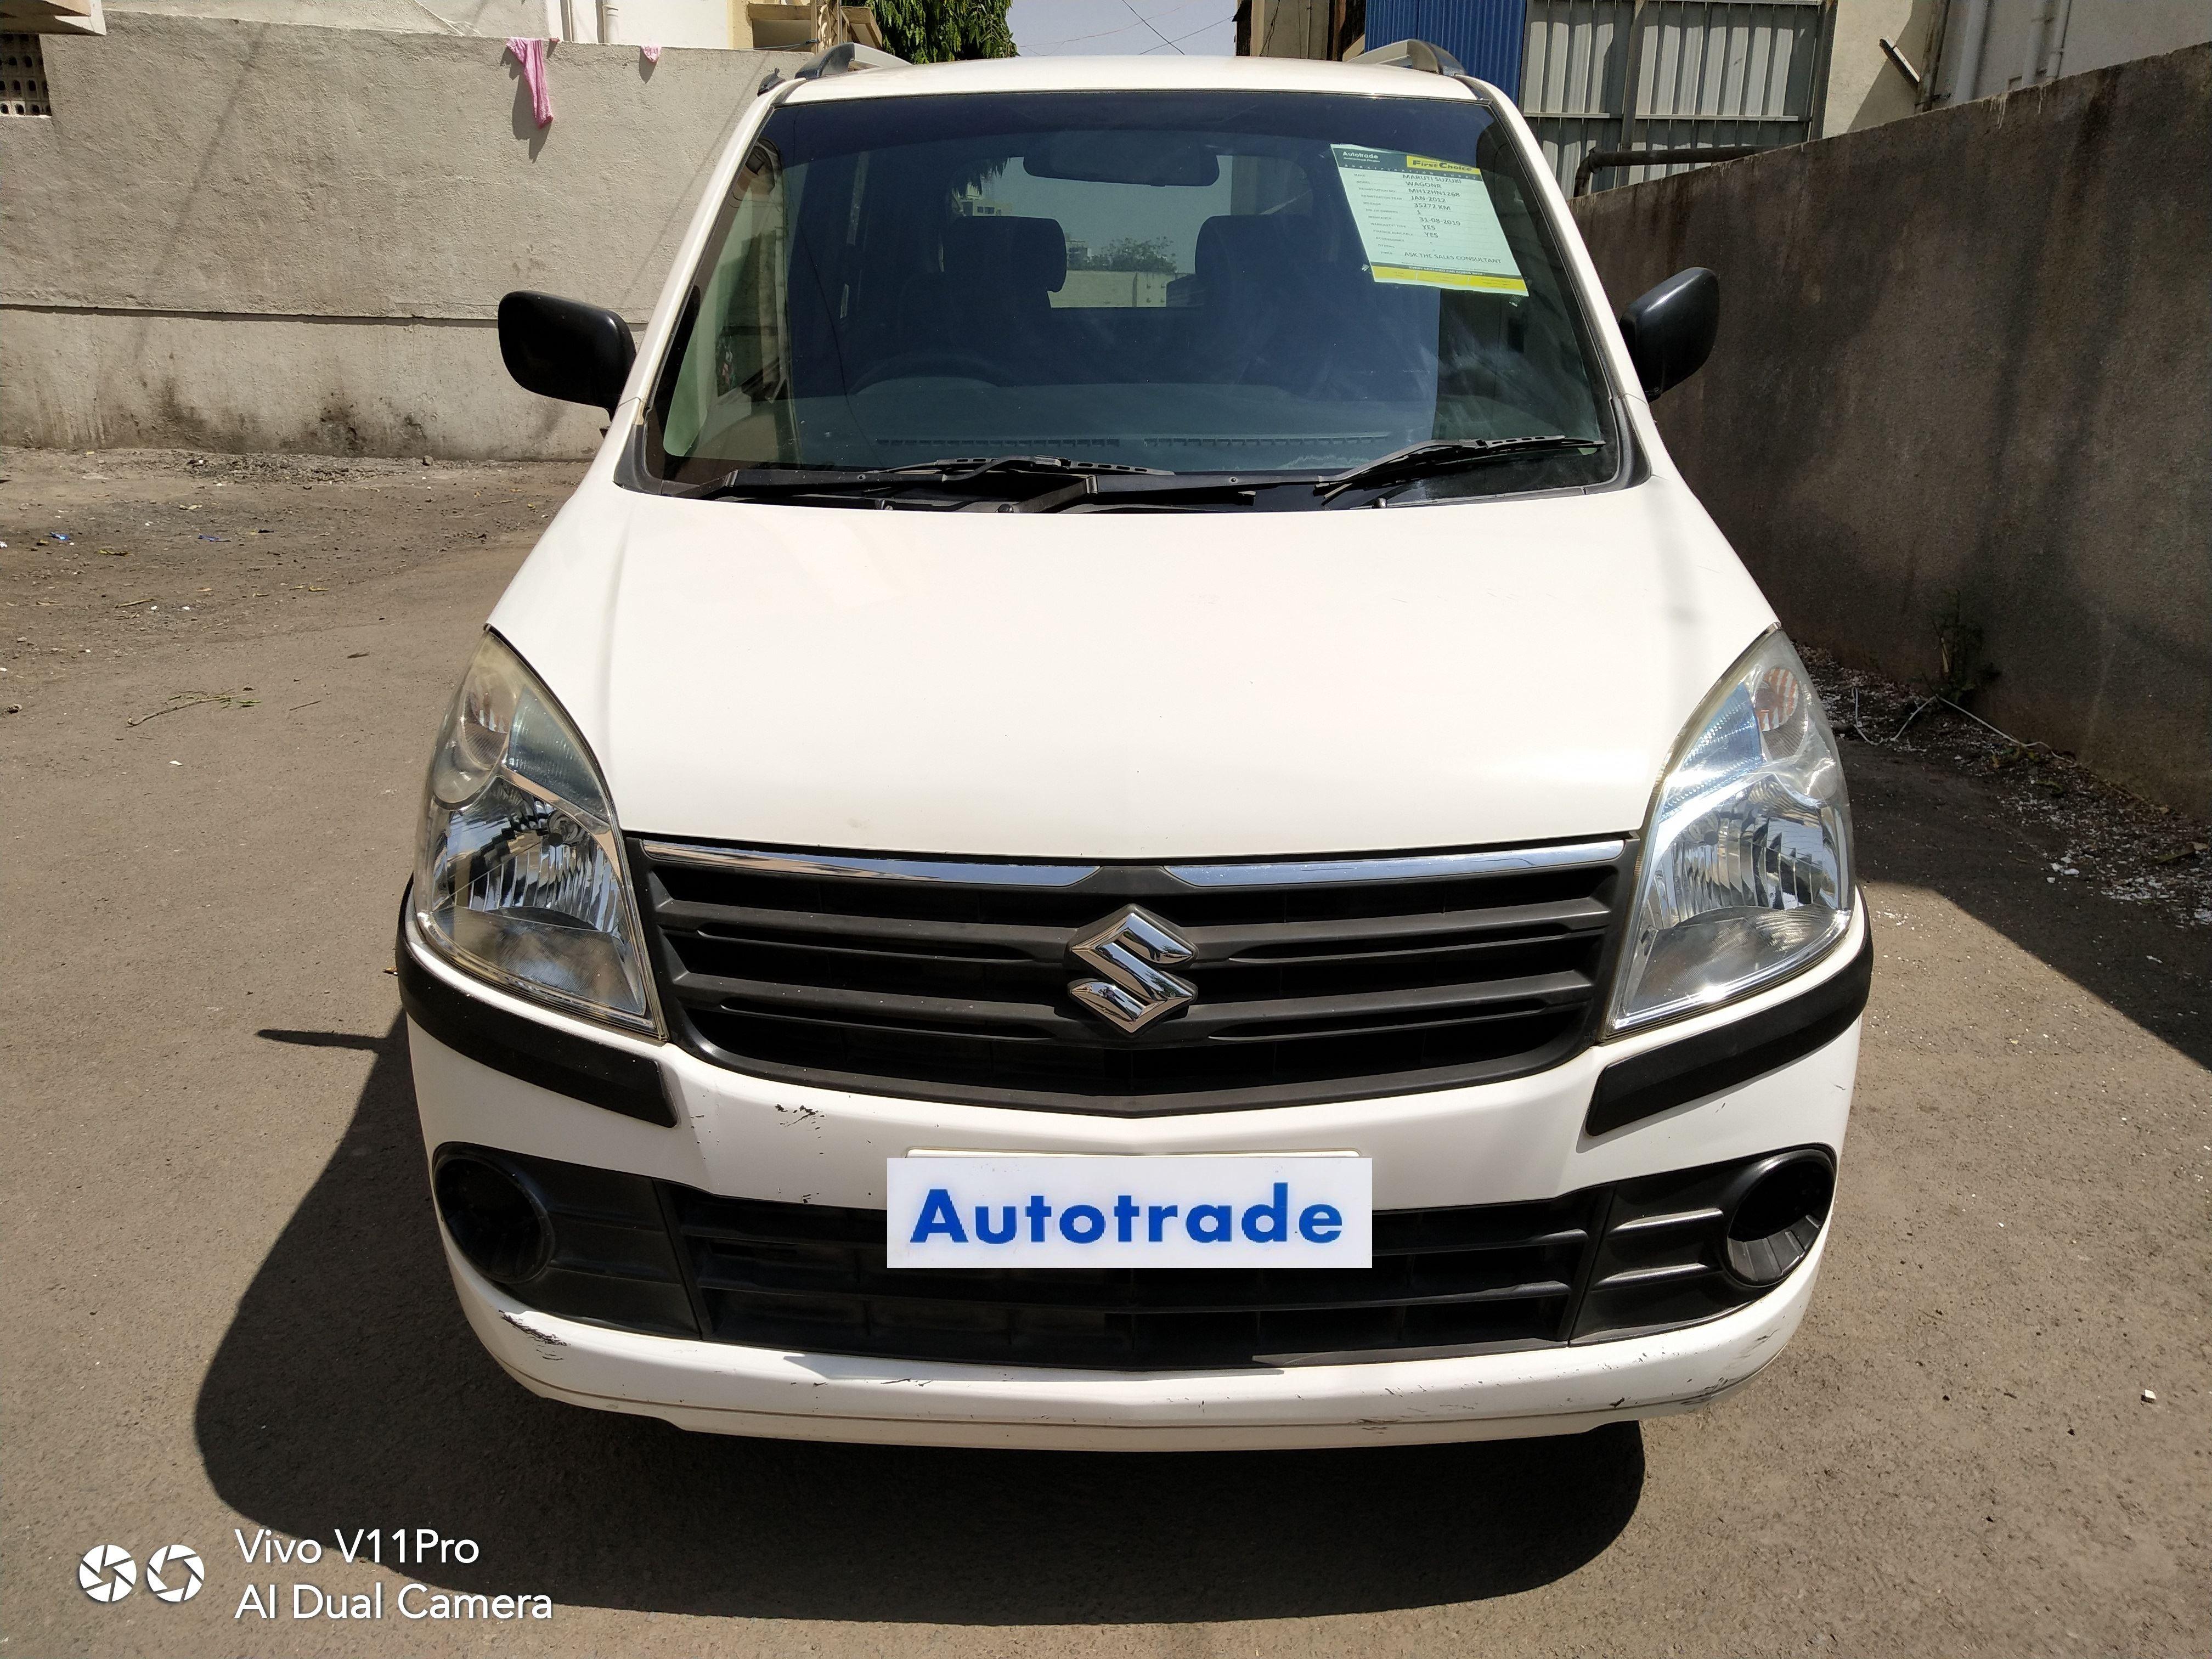 Maruti Suzuki Wagon R 1 0 Lxi - Mahindra First Choice